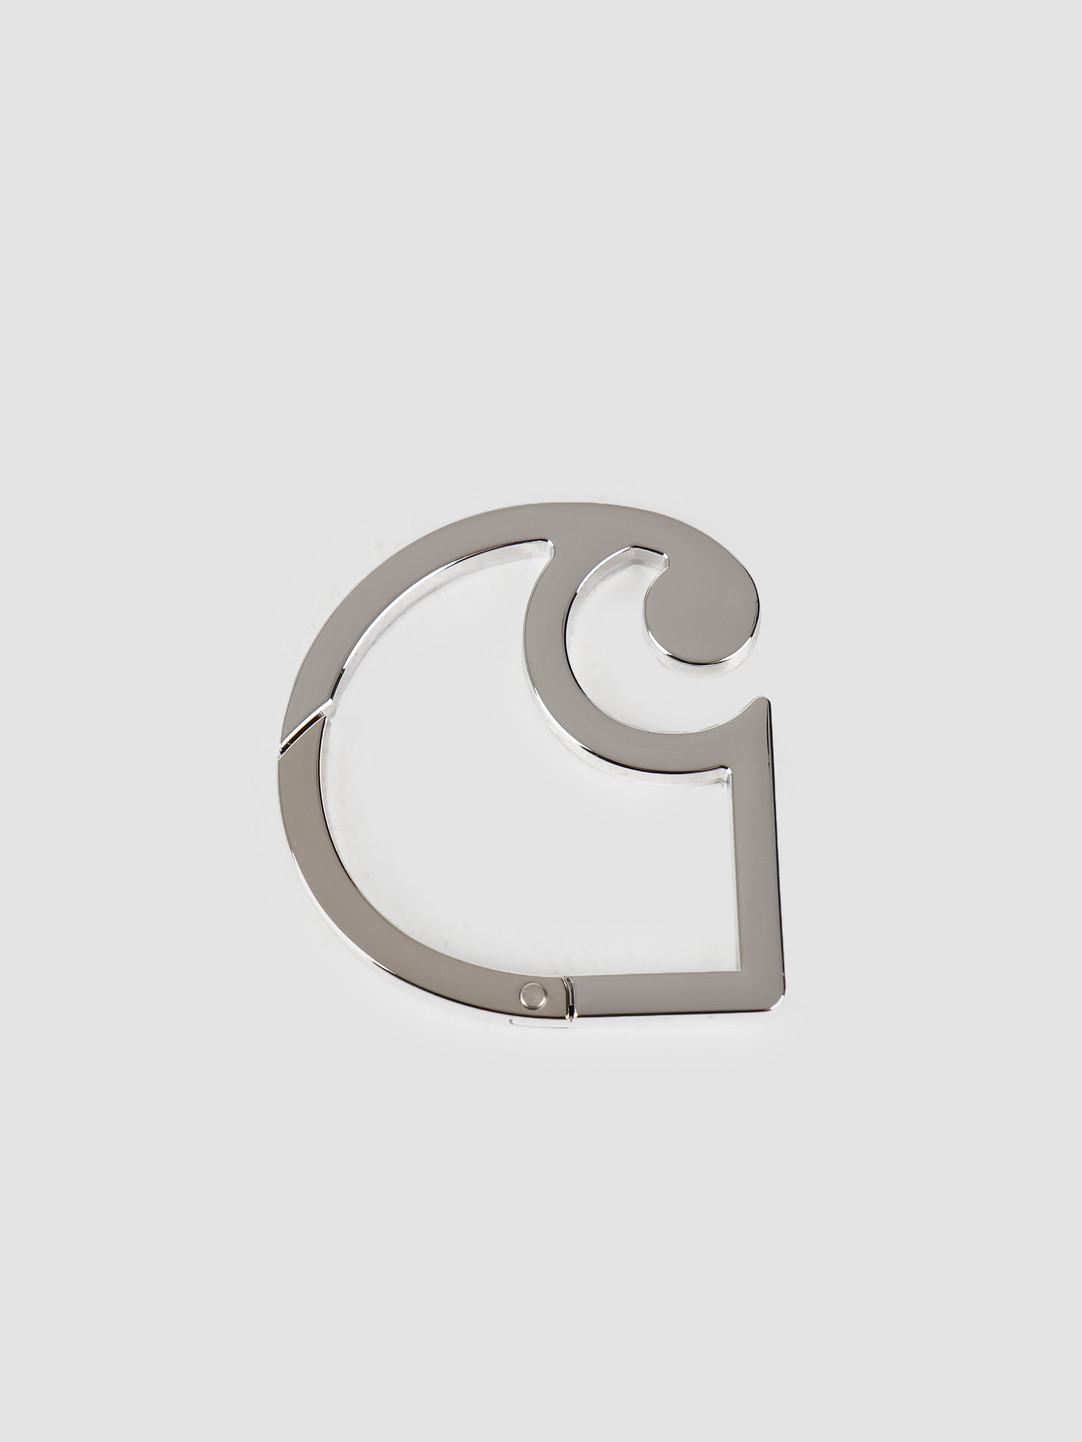 Carhartt WIP Carhartt WIP C Logo Carabiner Silver I026762